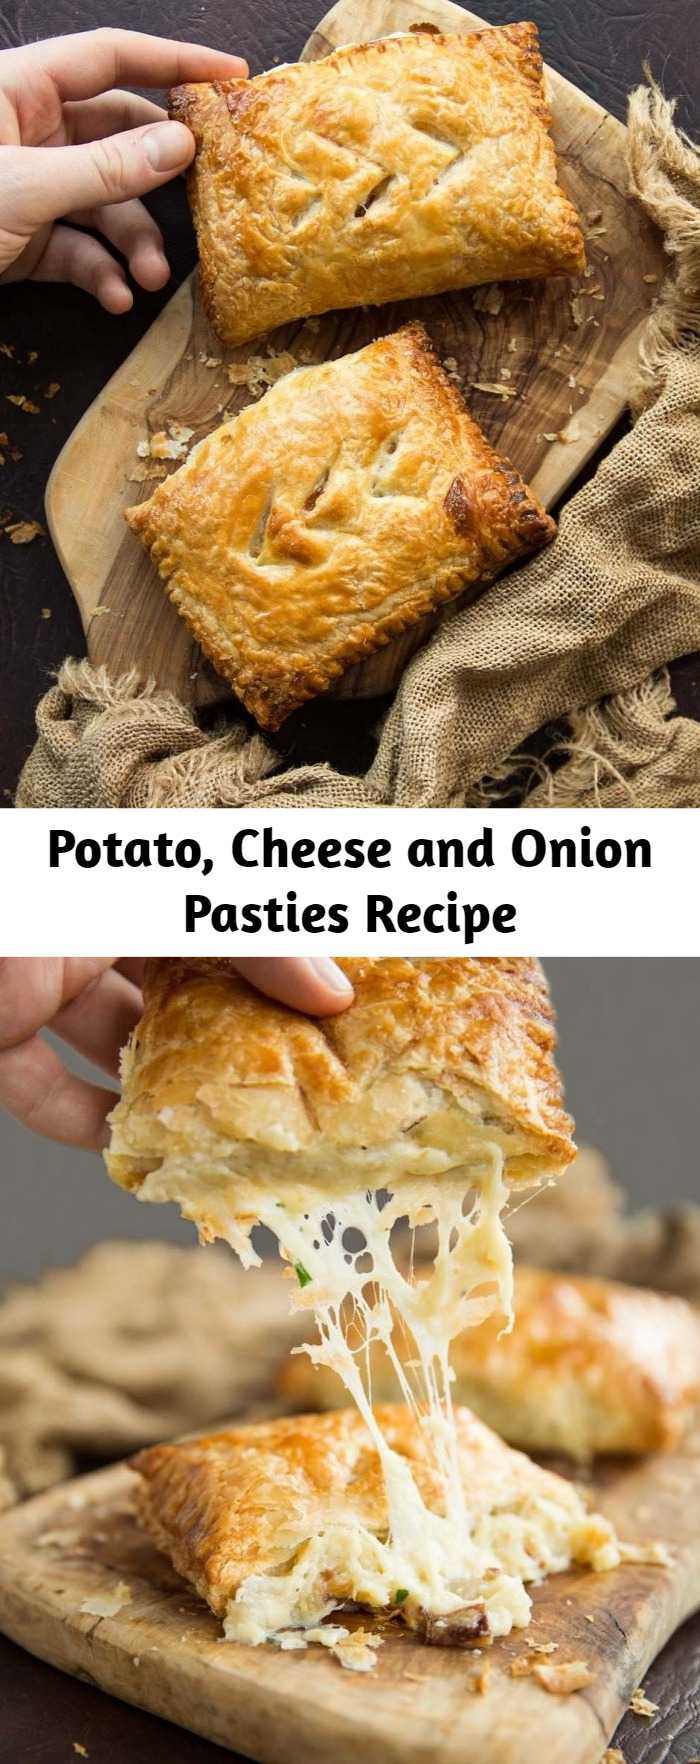 Potato, Cheese and Onion Pasties Recipe